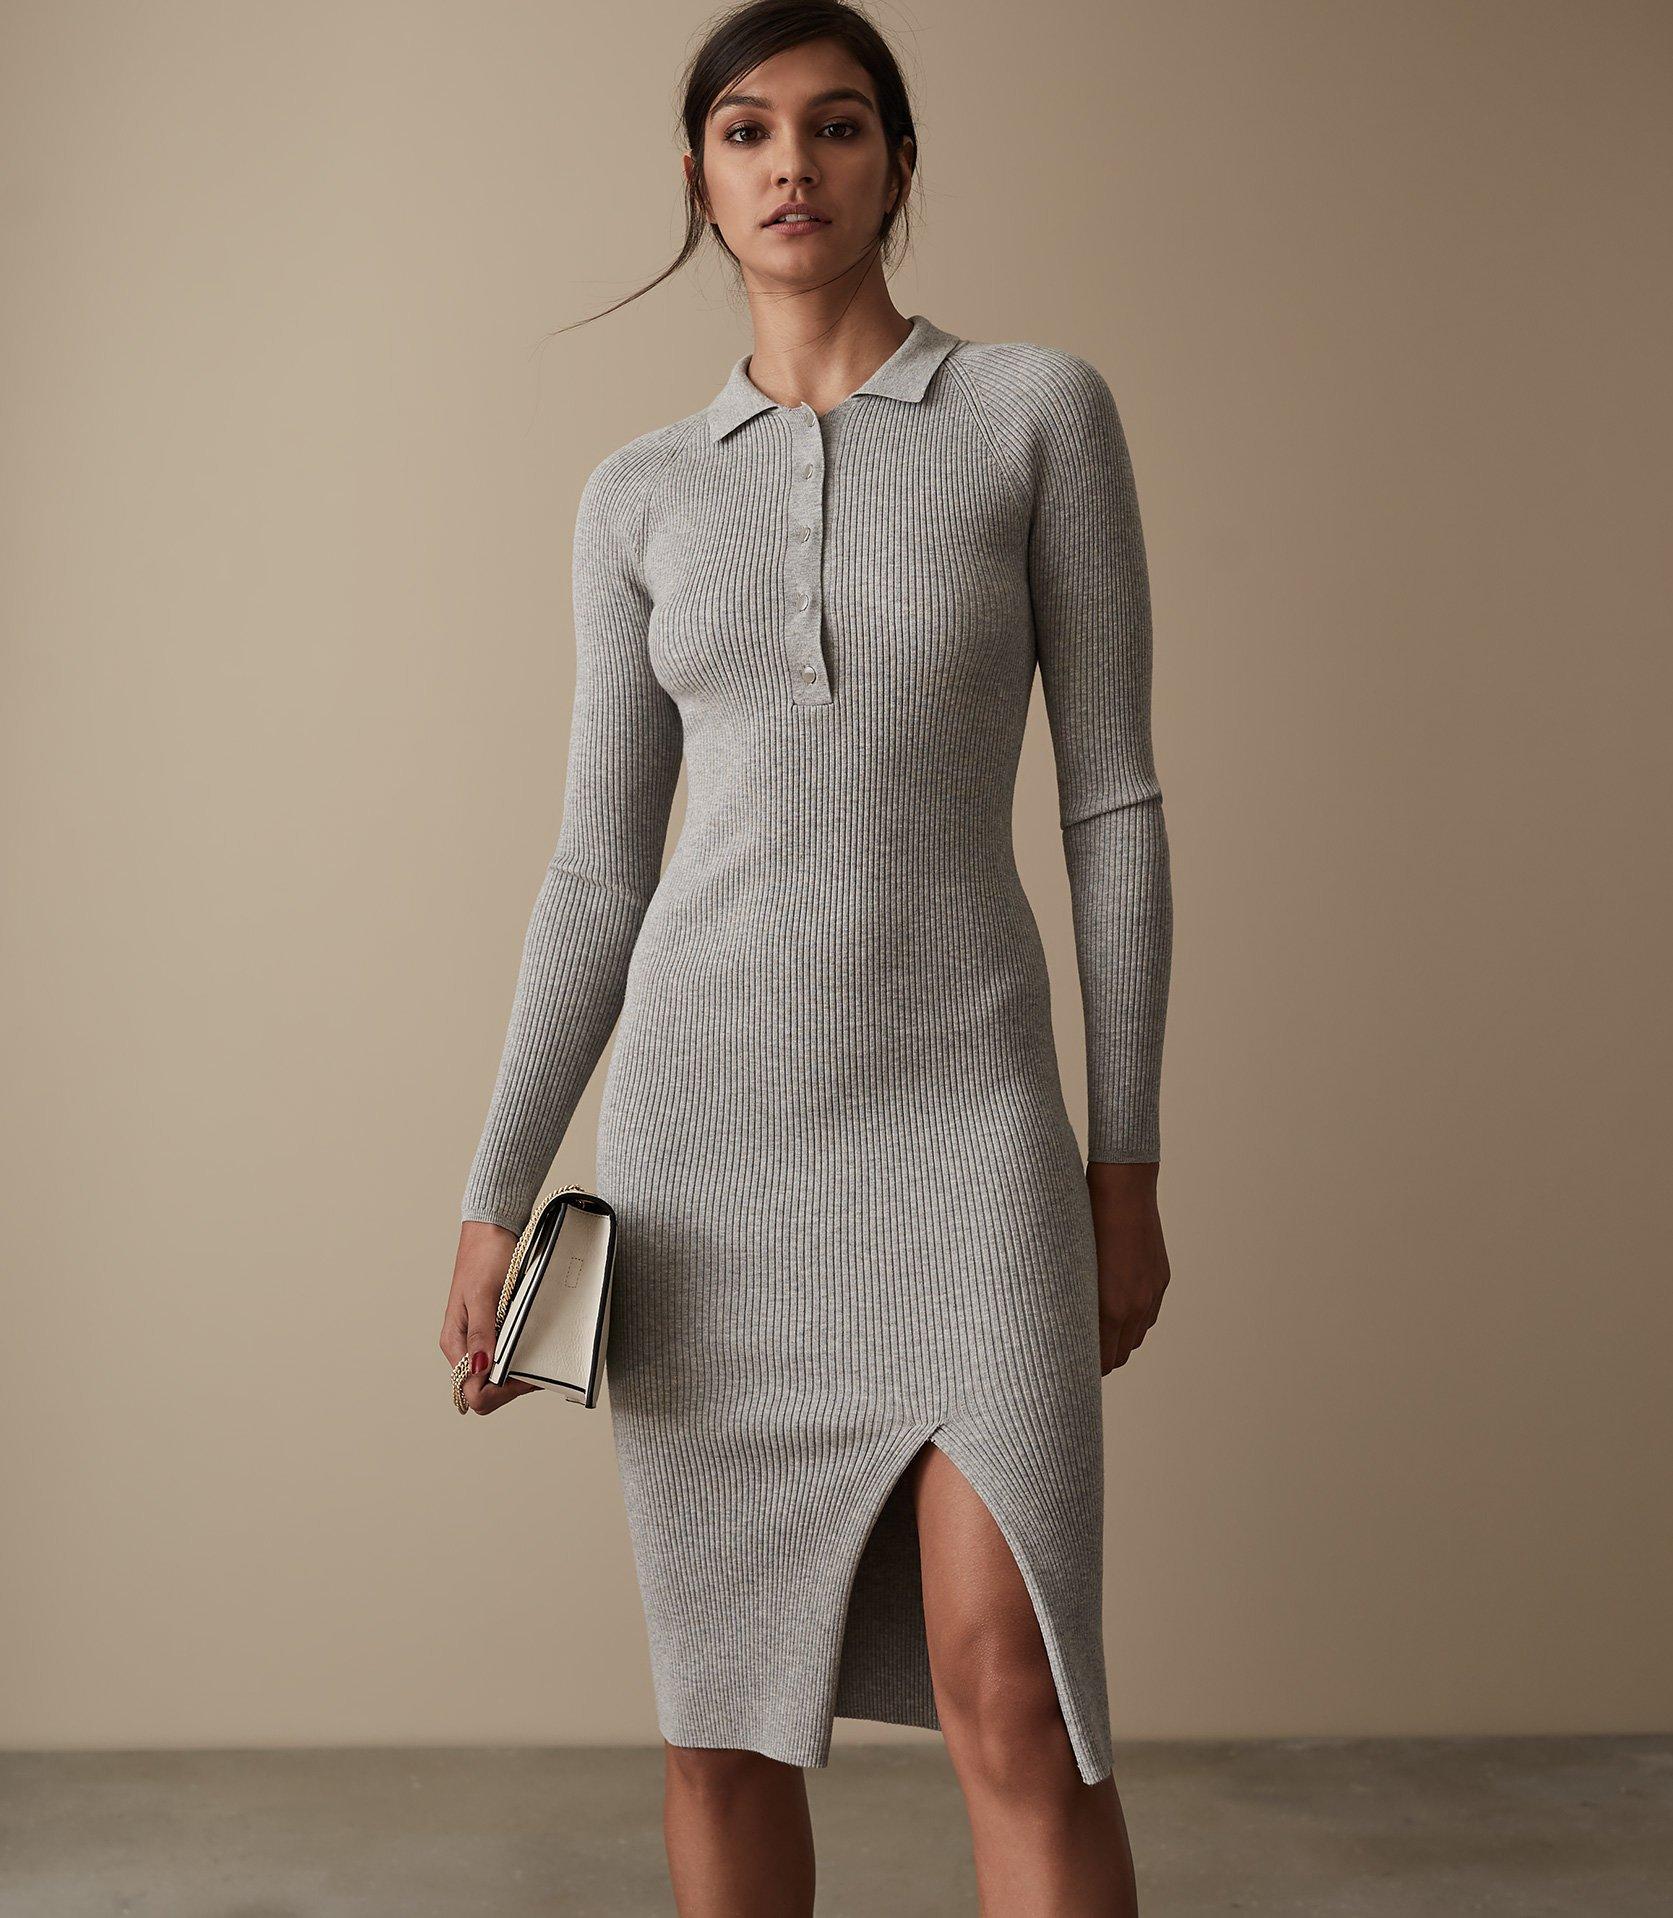 Louise Button Collar Knitted Dress - REISS